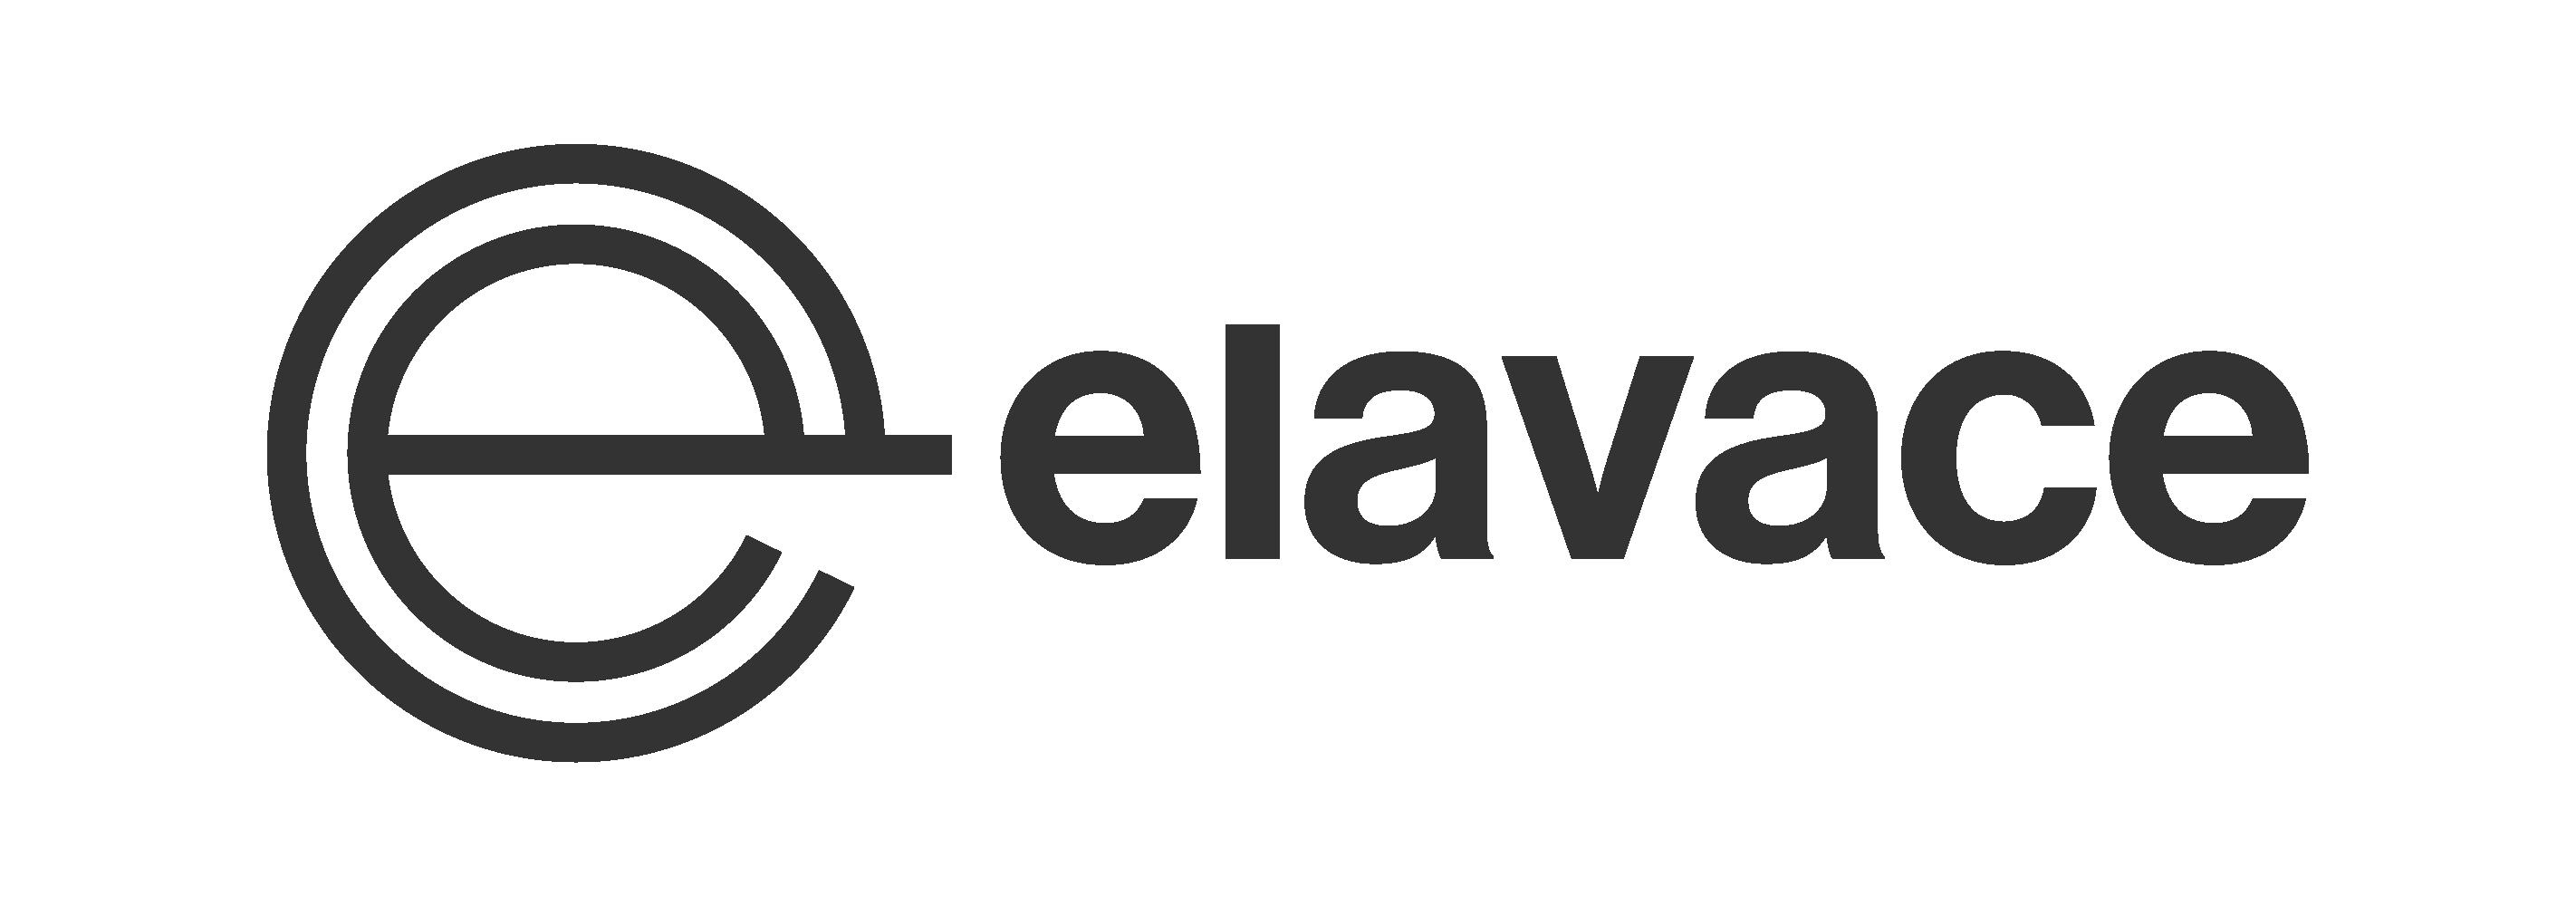 elavace property investments logo